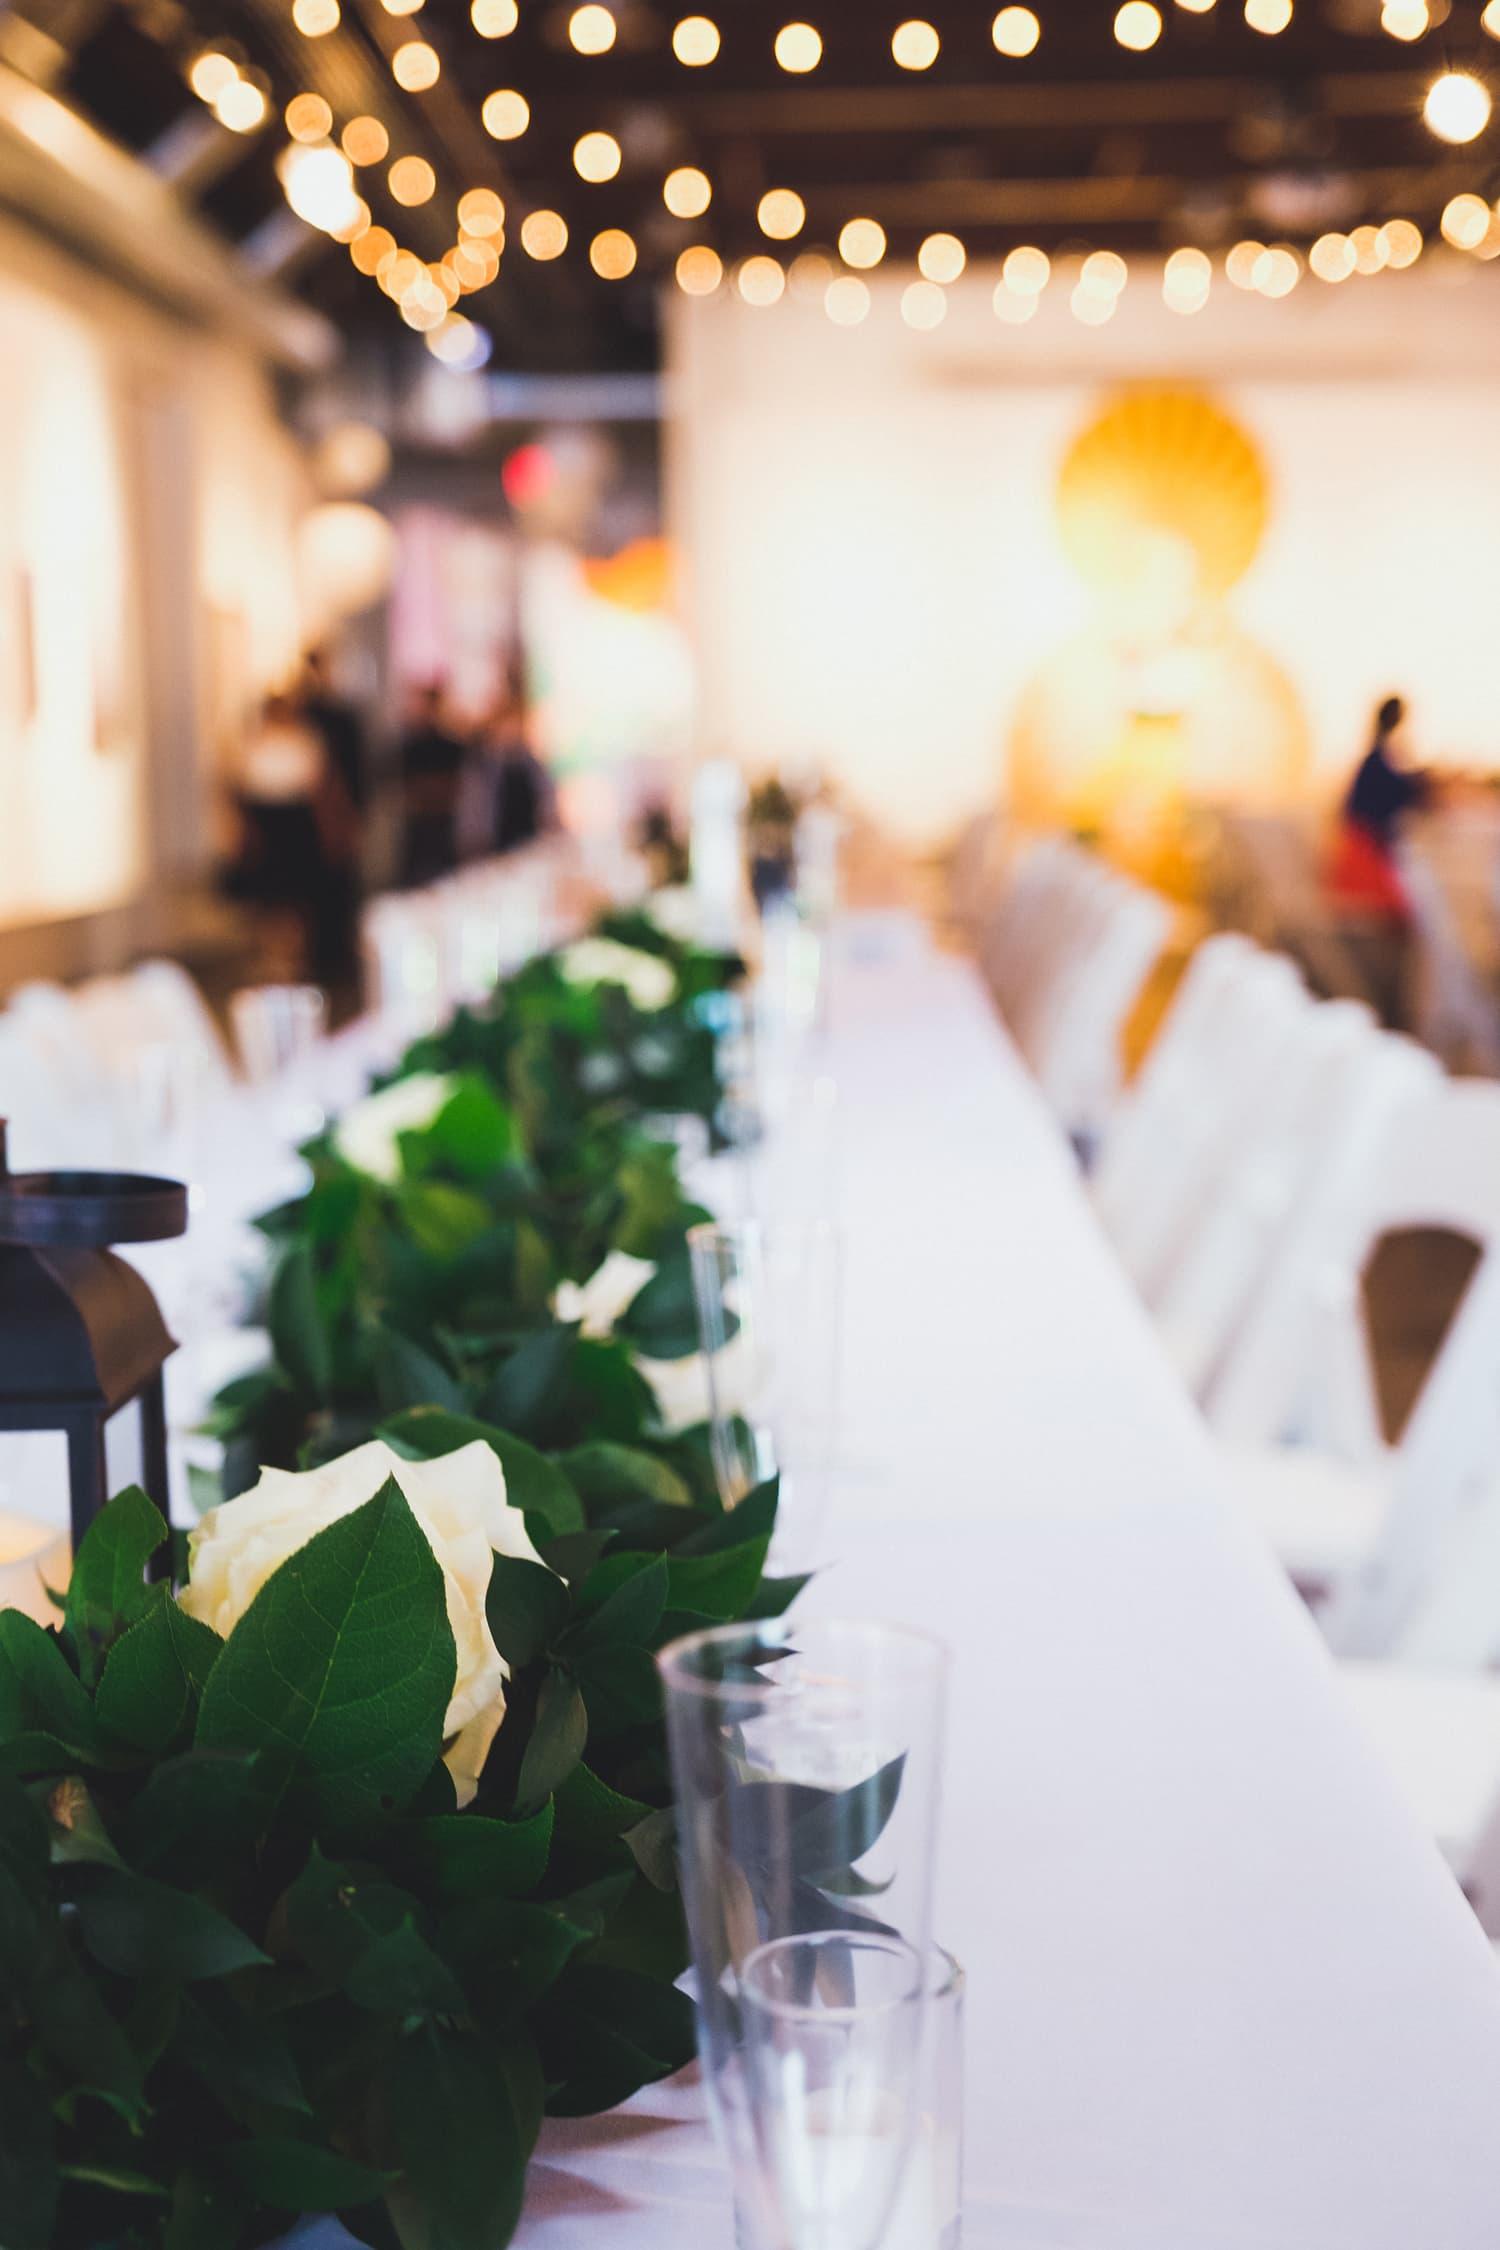 IAO Gallery wedding in Oklahoma City // Photo by Leia Smethurst Photography